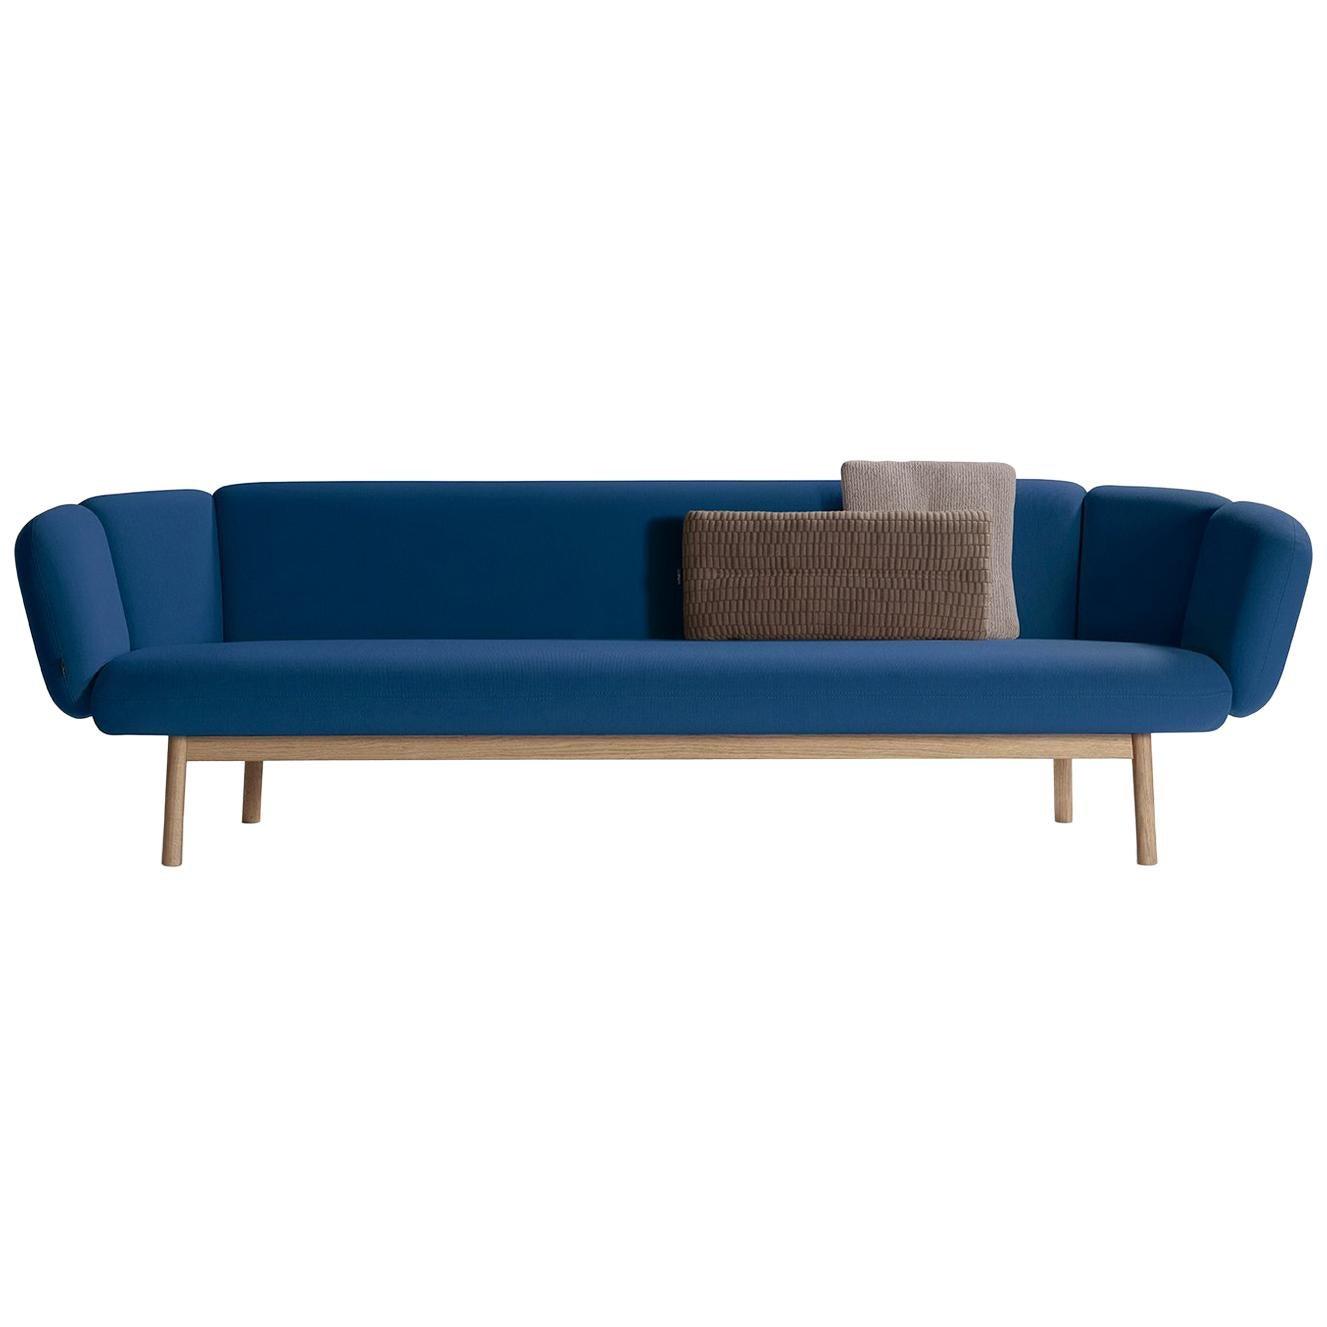 Artifort Bras Sofa in Blue by Khodi Feiz